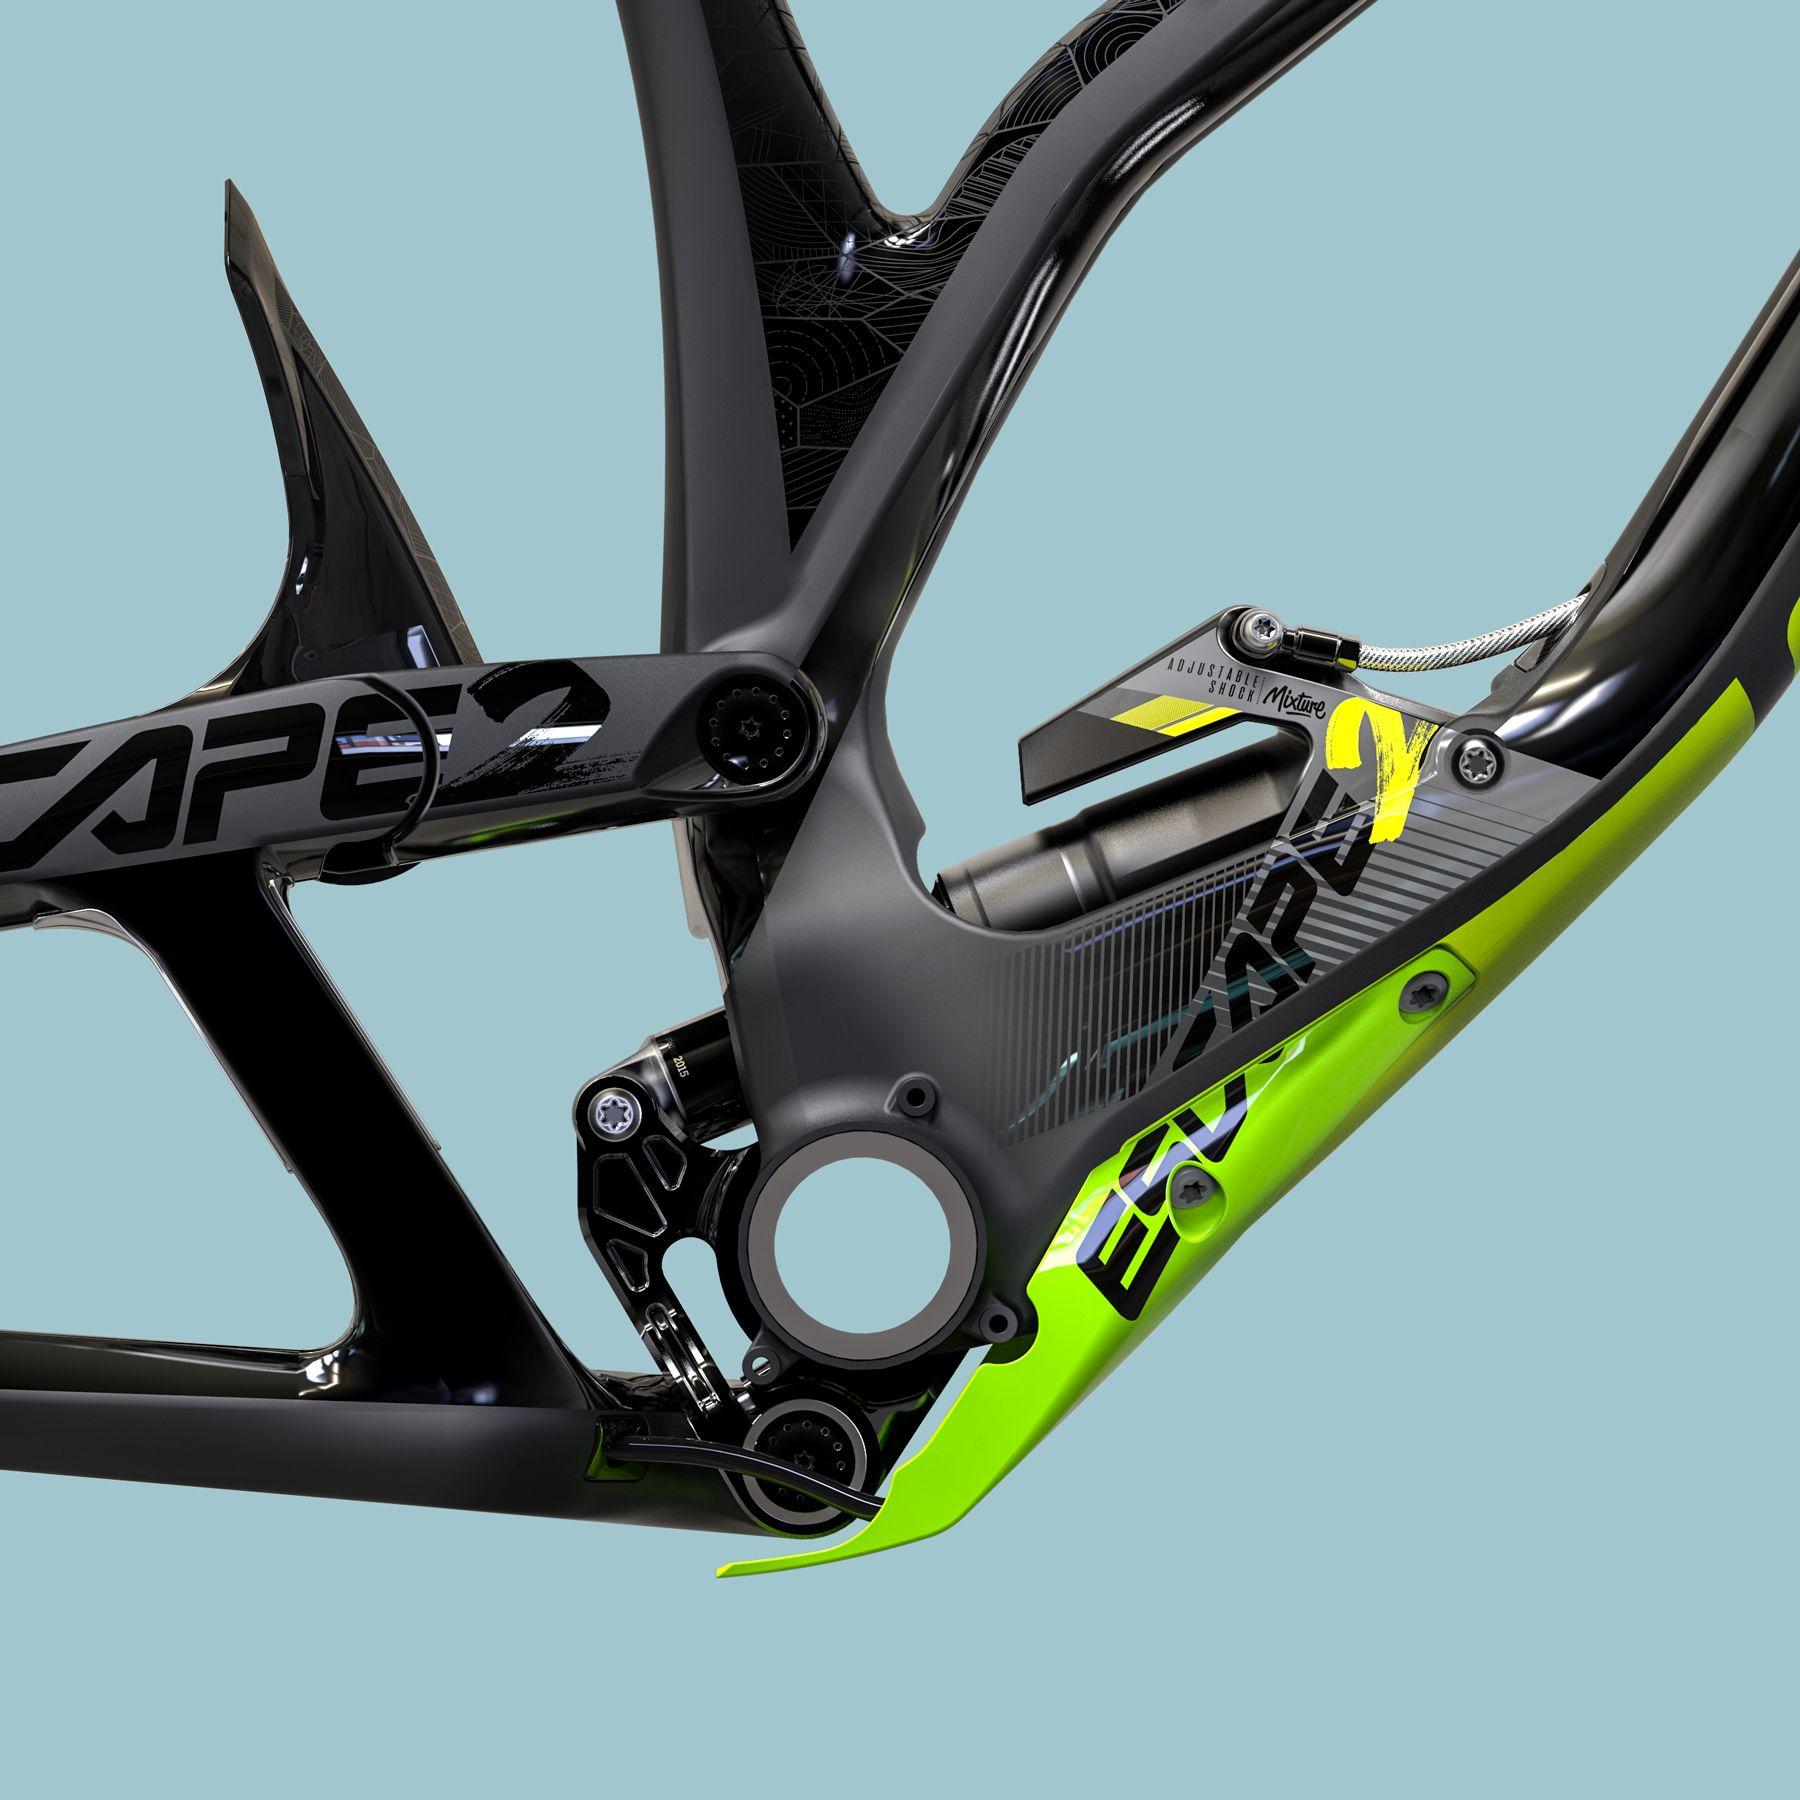 Mixture Escape2 Web 13 Jpg 1 800 1 800 Pixels Design De Bicicleta Bike Eletrica Veículos